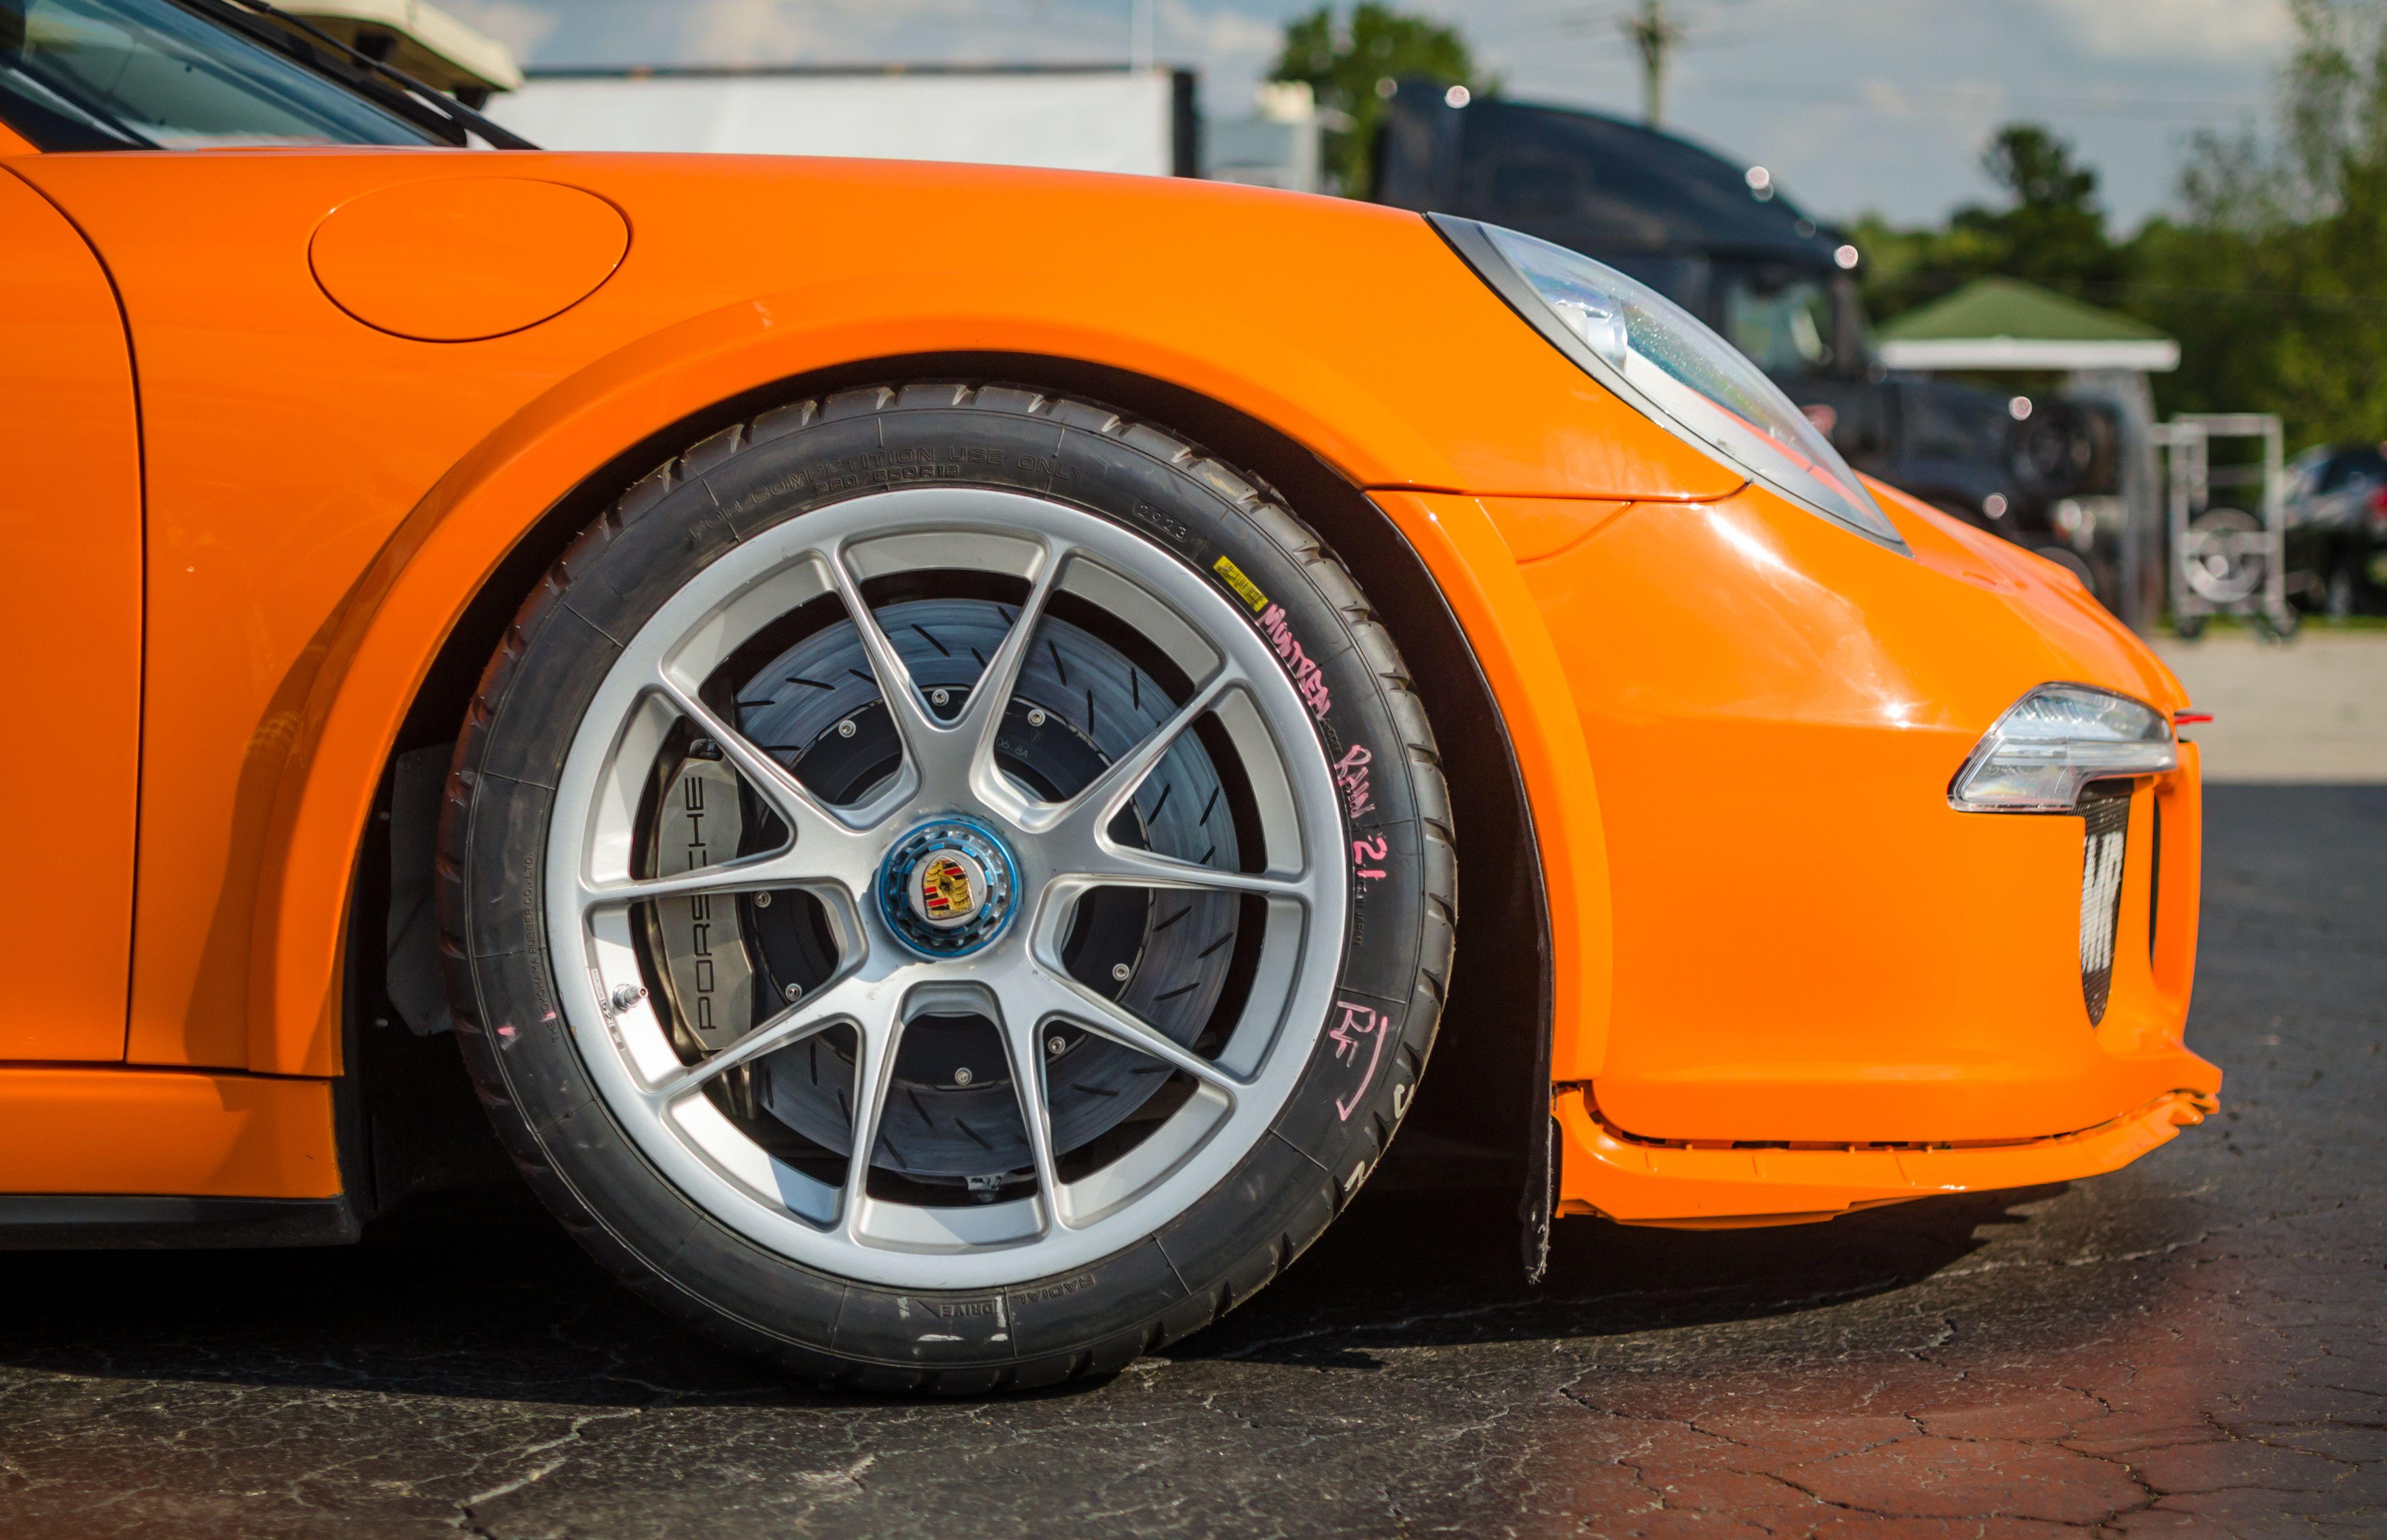 Jagermeister Orange Porsche 991 GT3 Cup [4439x2864] [OC]   Cars ...